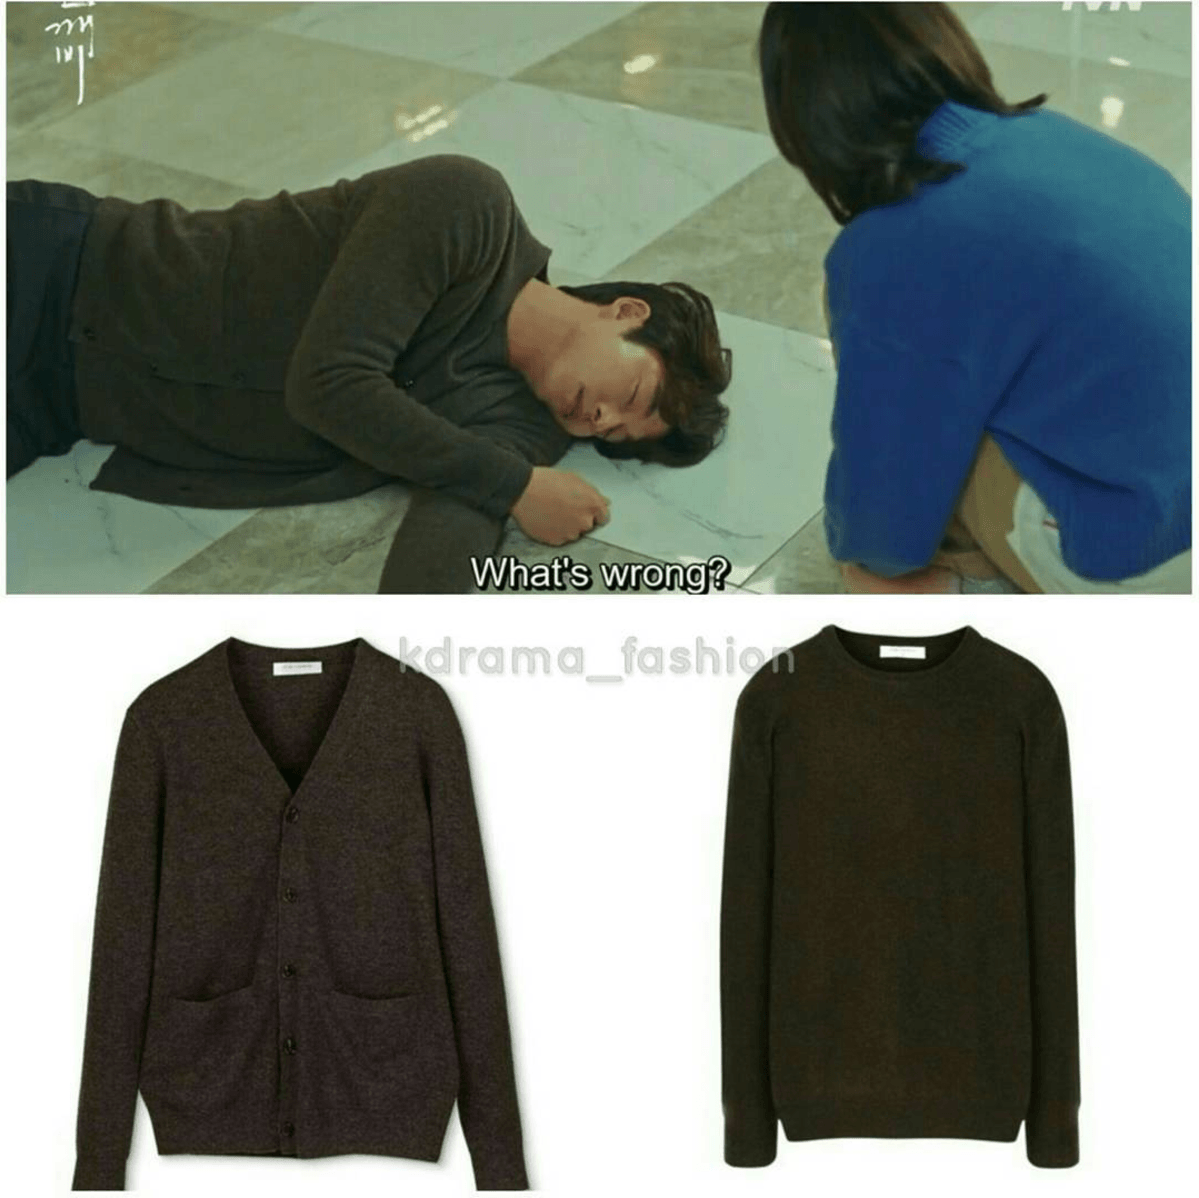 pure-cashmere-2016-new-collection-men-crew-neck-sweater-cocoa-brown-w-v-neck-cardigan-cocoa-brown